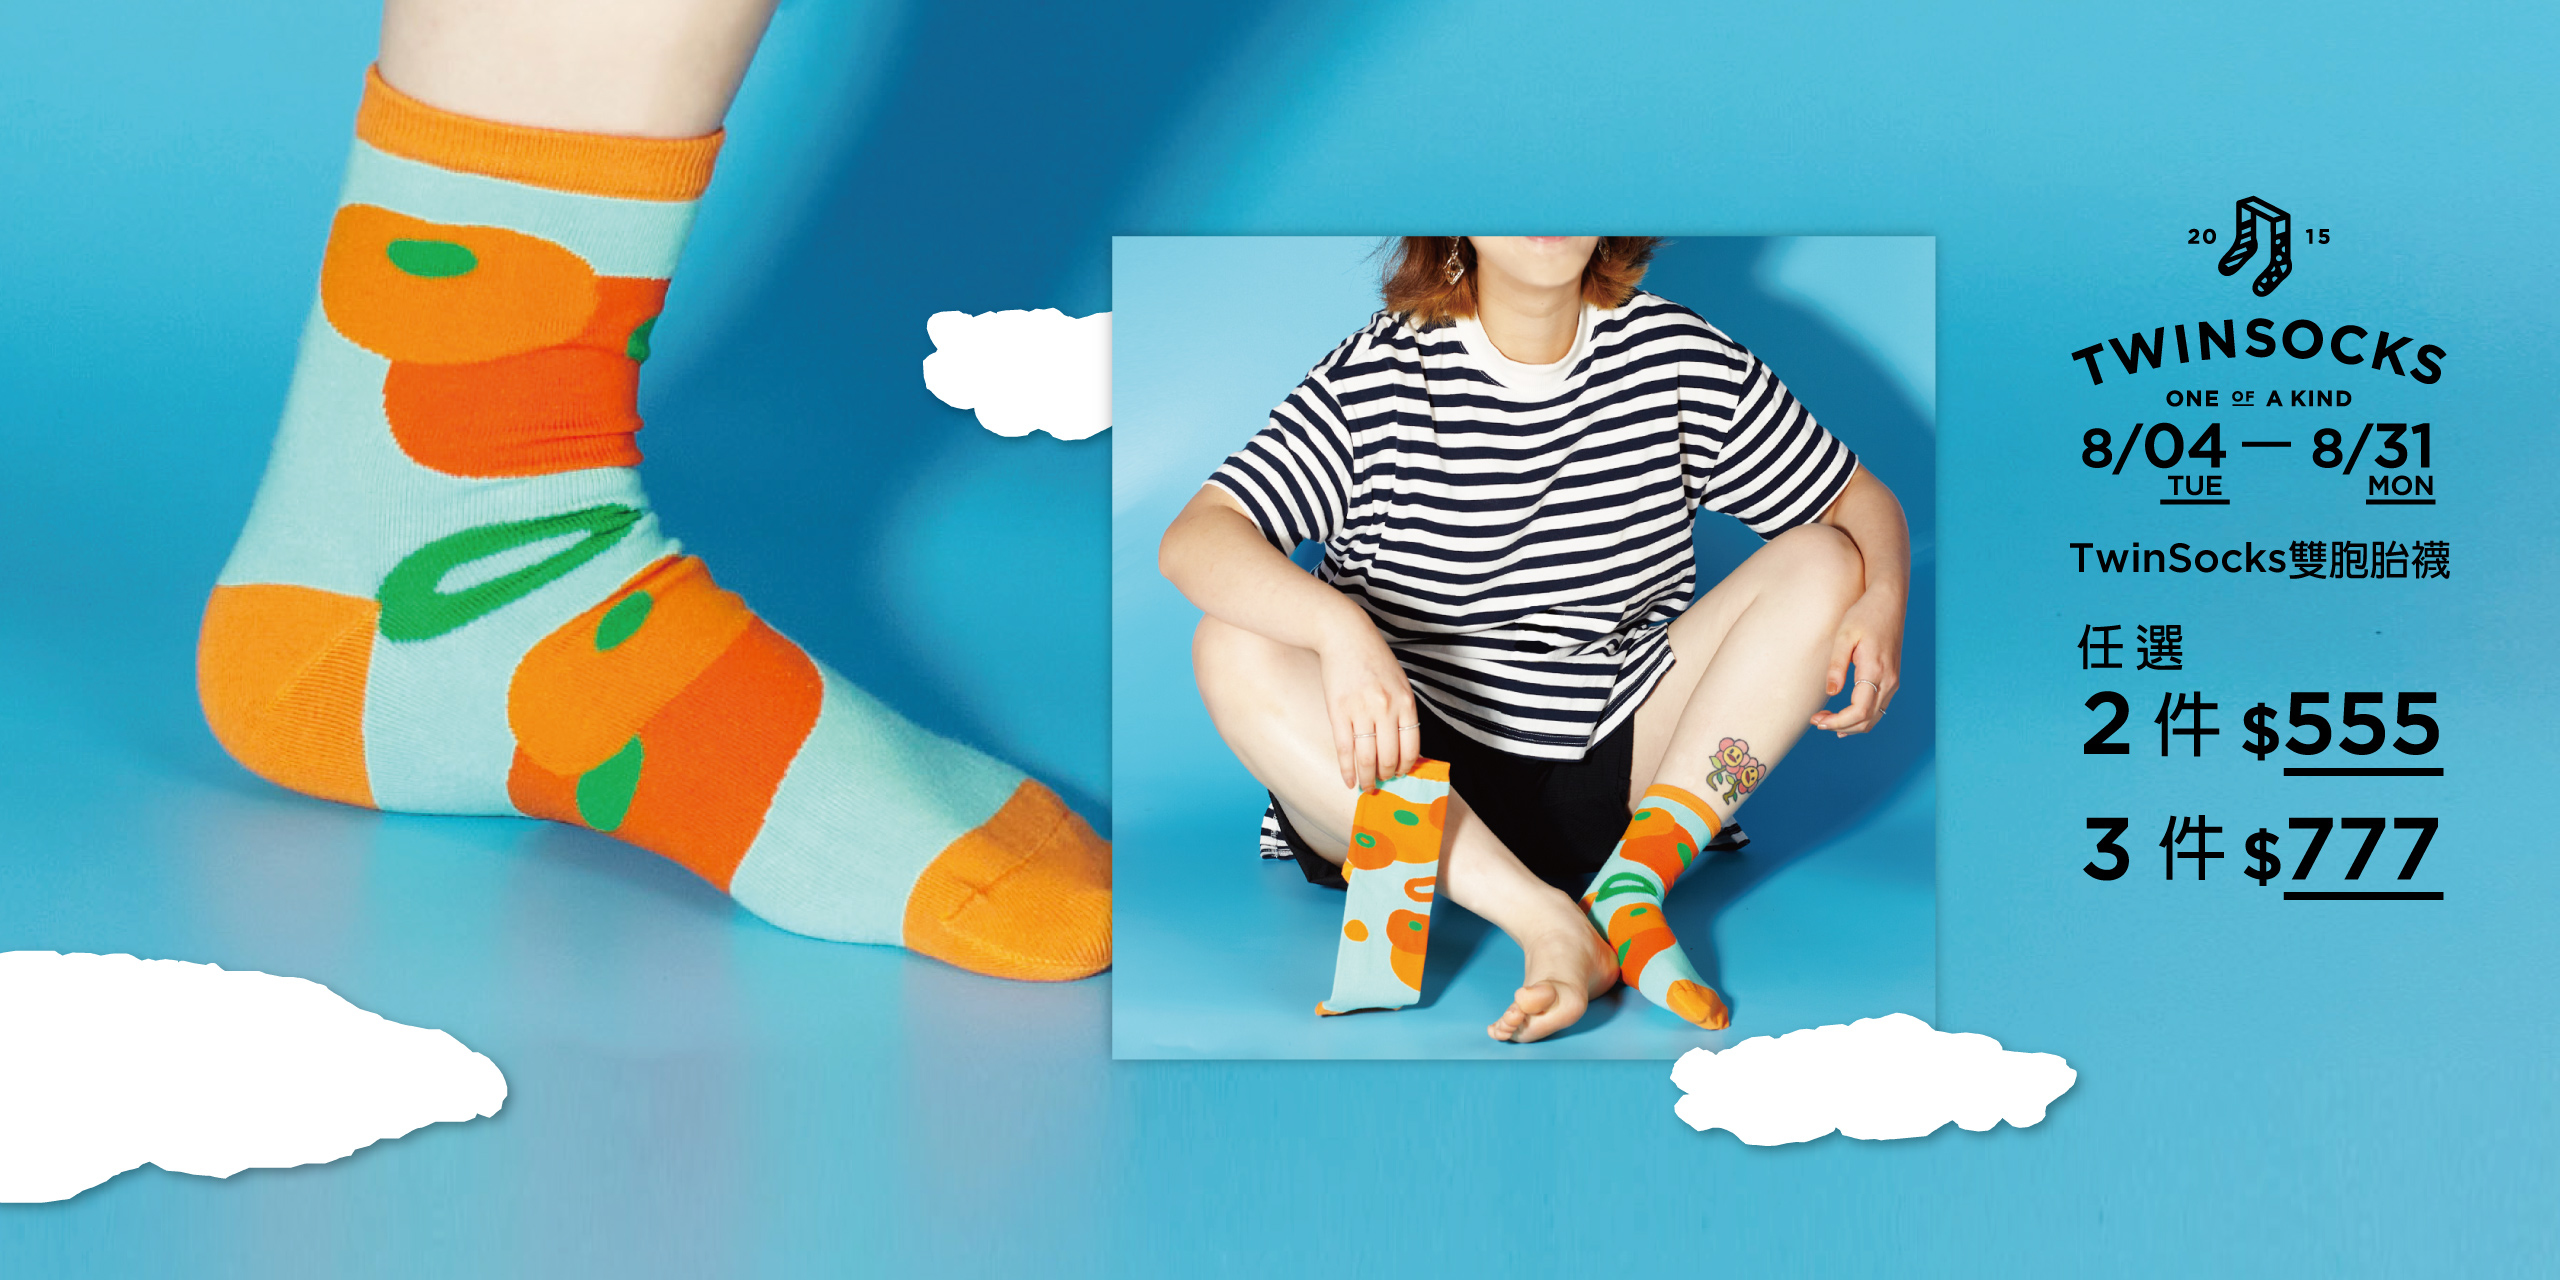 havaianas,哈瓦仕,哈瓦那,涼鞋,拖鞋,人字拖,後背包,文青包,托特包,小包,PM小包,襪子,TwinSocks,雙胞胎襪